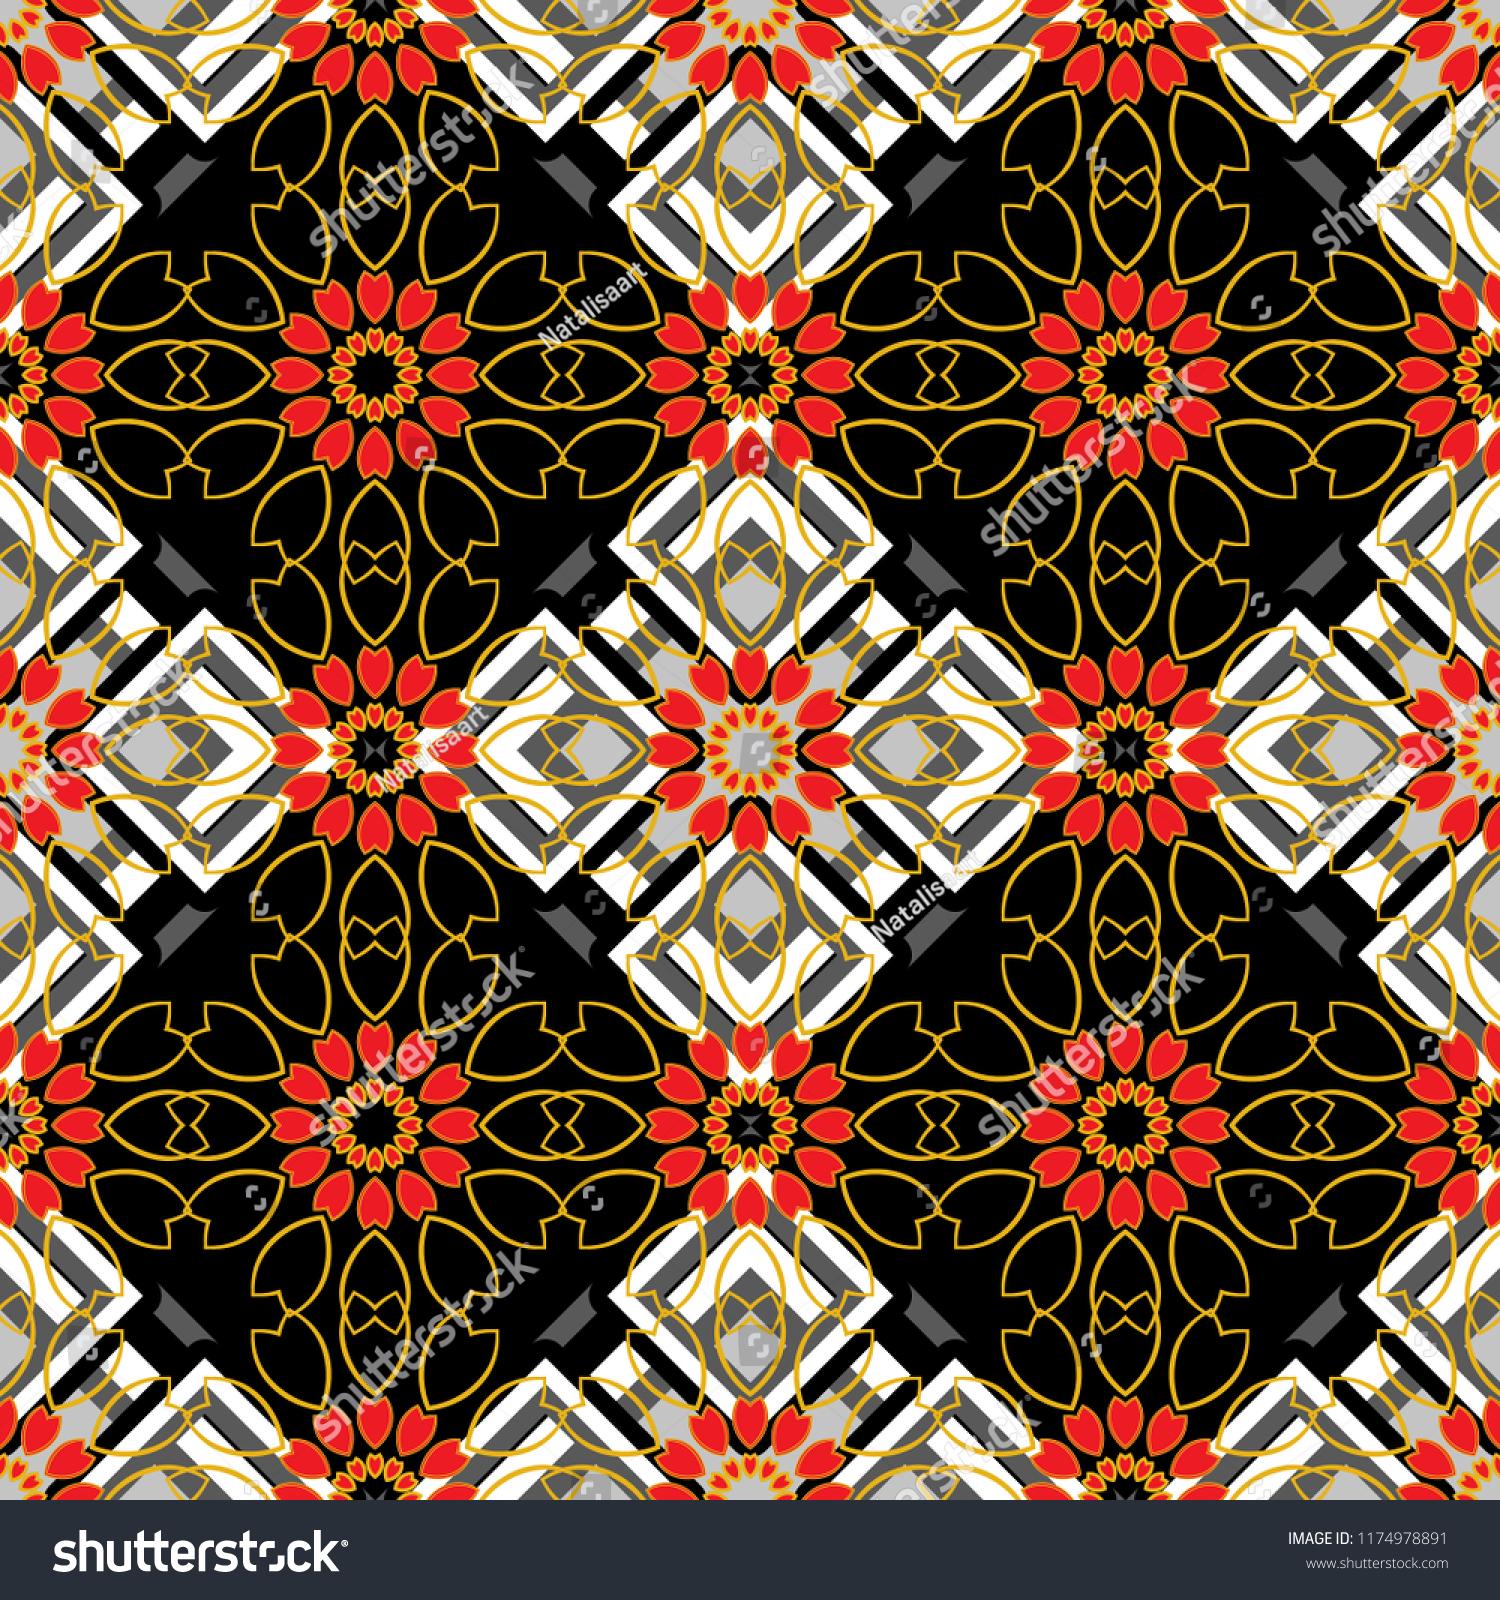 Random geometric shapes seamless pattern in gray orange and black colors print card cloth shirts dress wrapper cover geometrical simple art